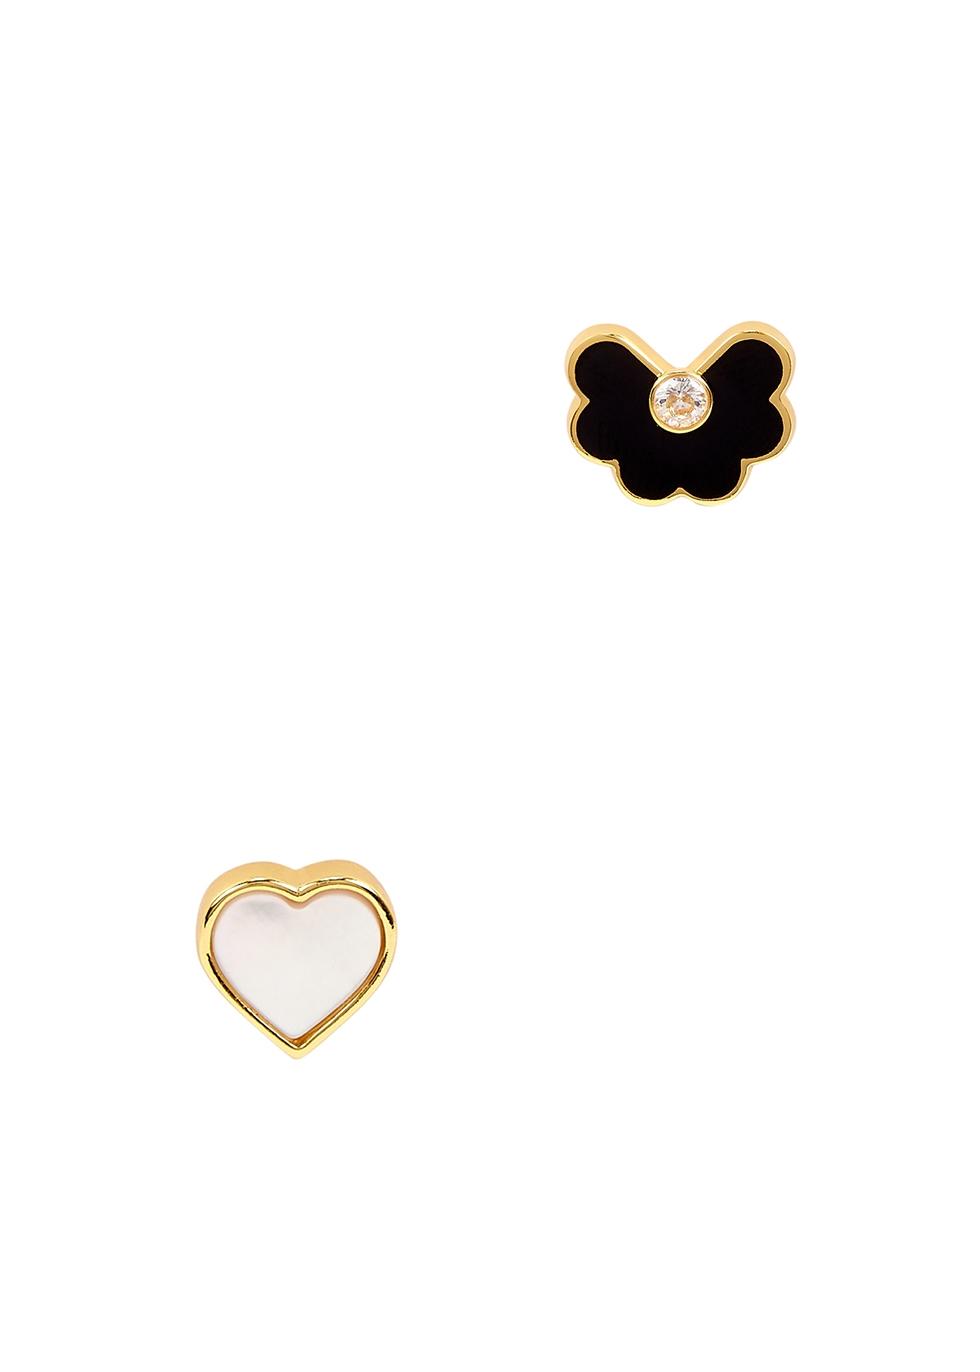 Spade Flower gold-plated stud earrings